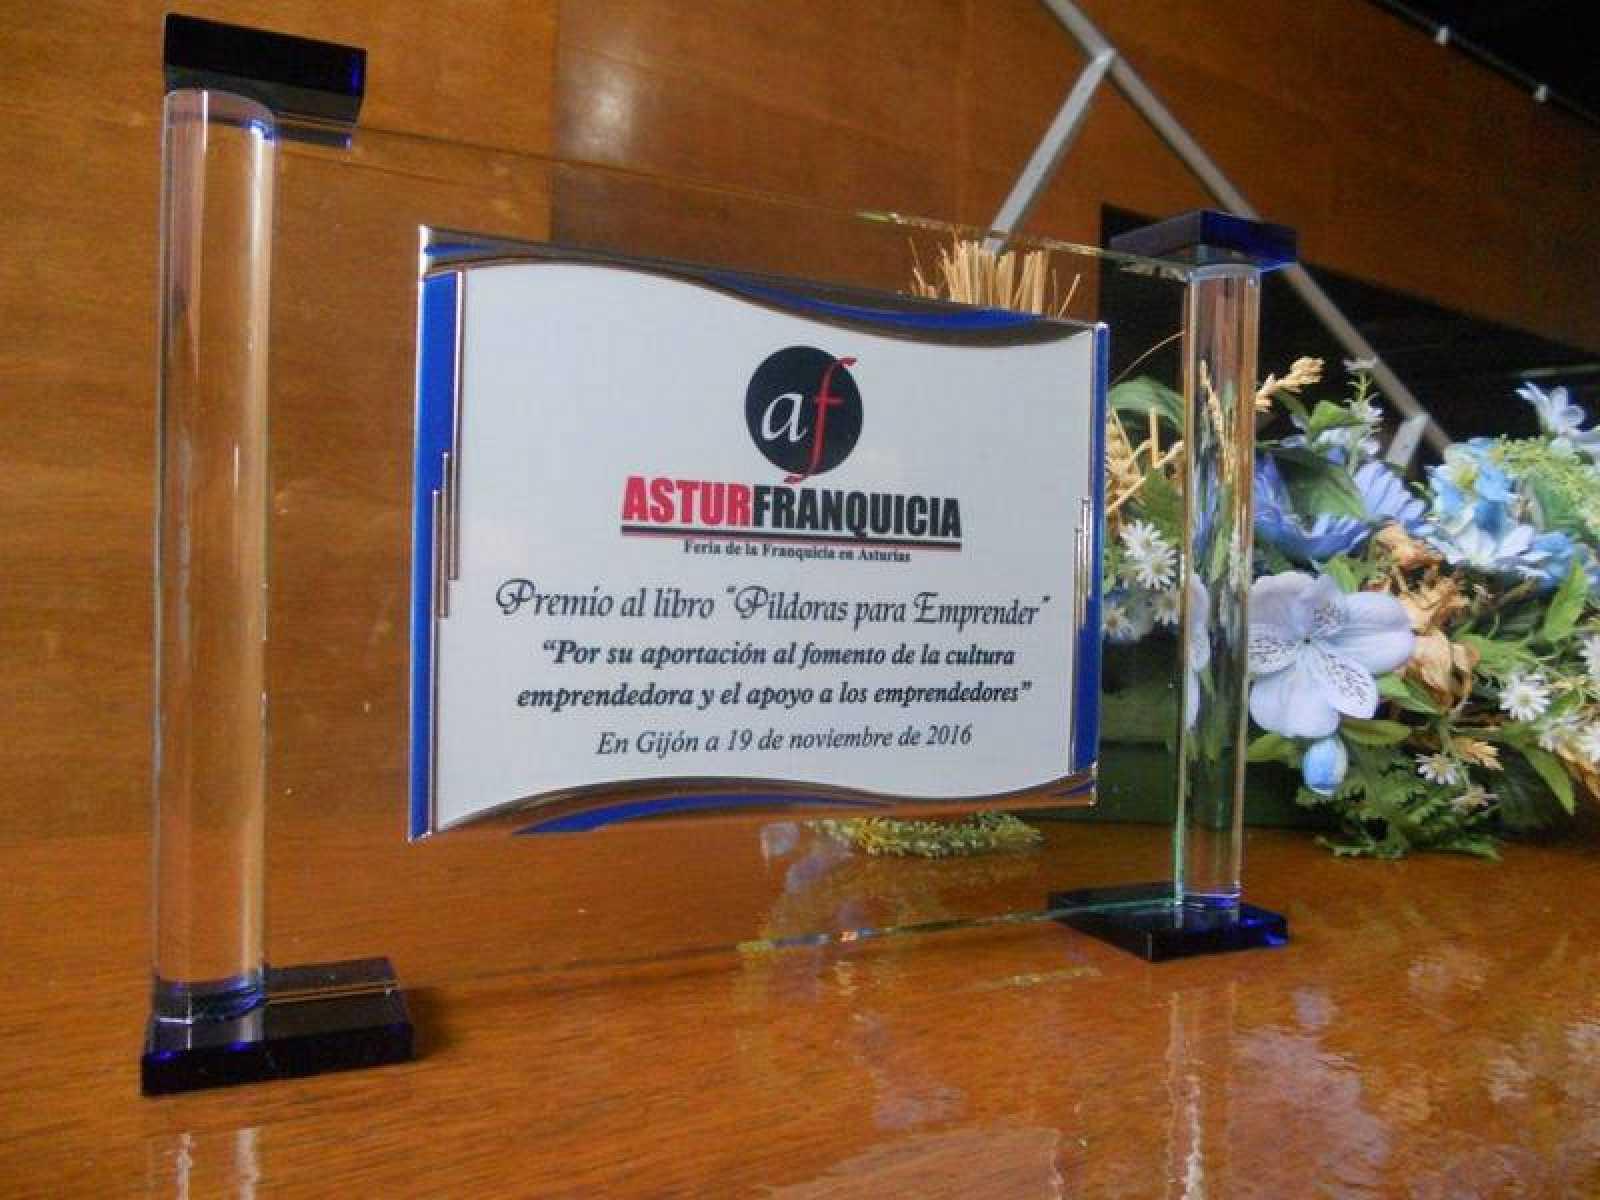 Premio en la Feria de la franquicia de Asturias